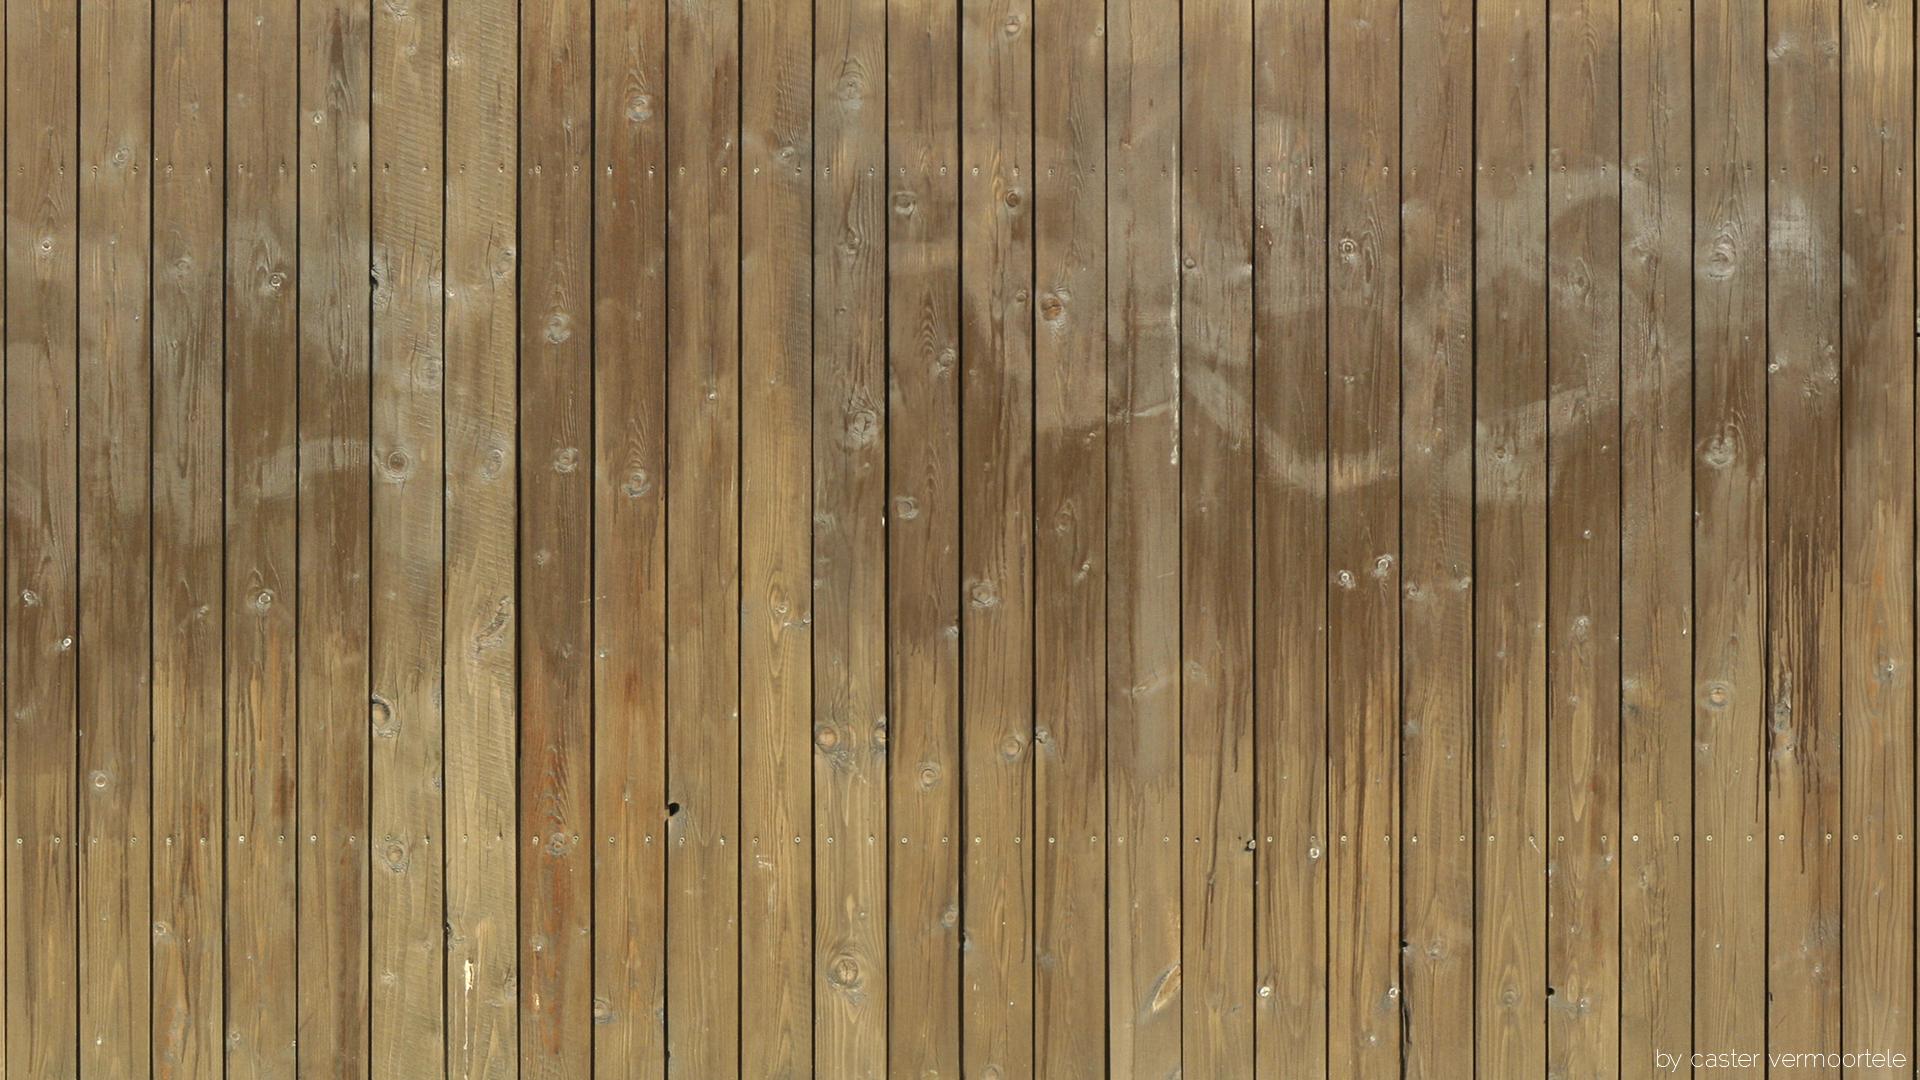 Texture Wallpaper Hd By Zuket Creation Floor Wallpaper Wooden Wallpaper Wood Wallpaper